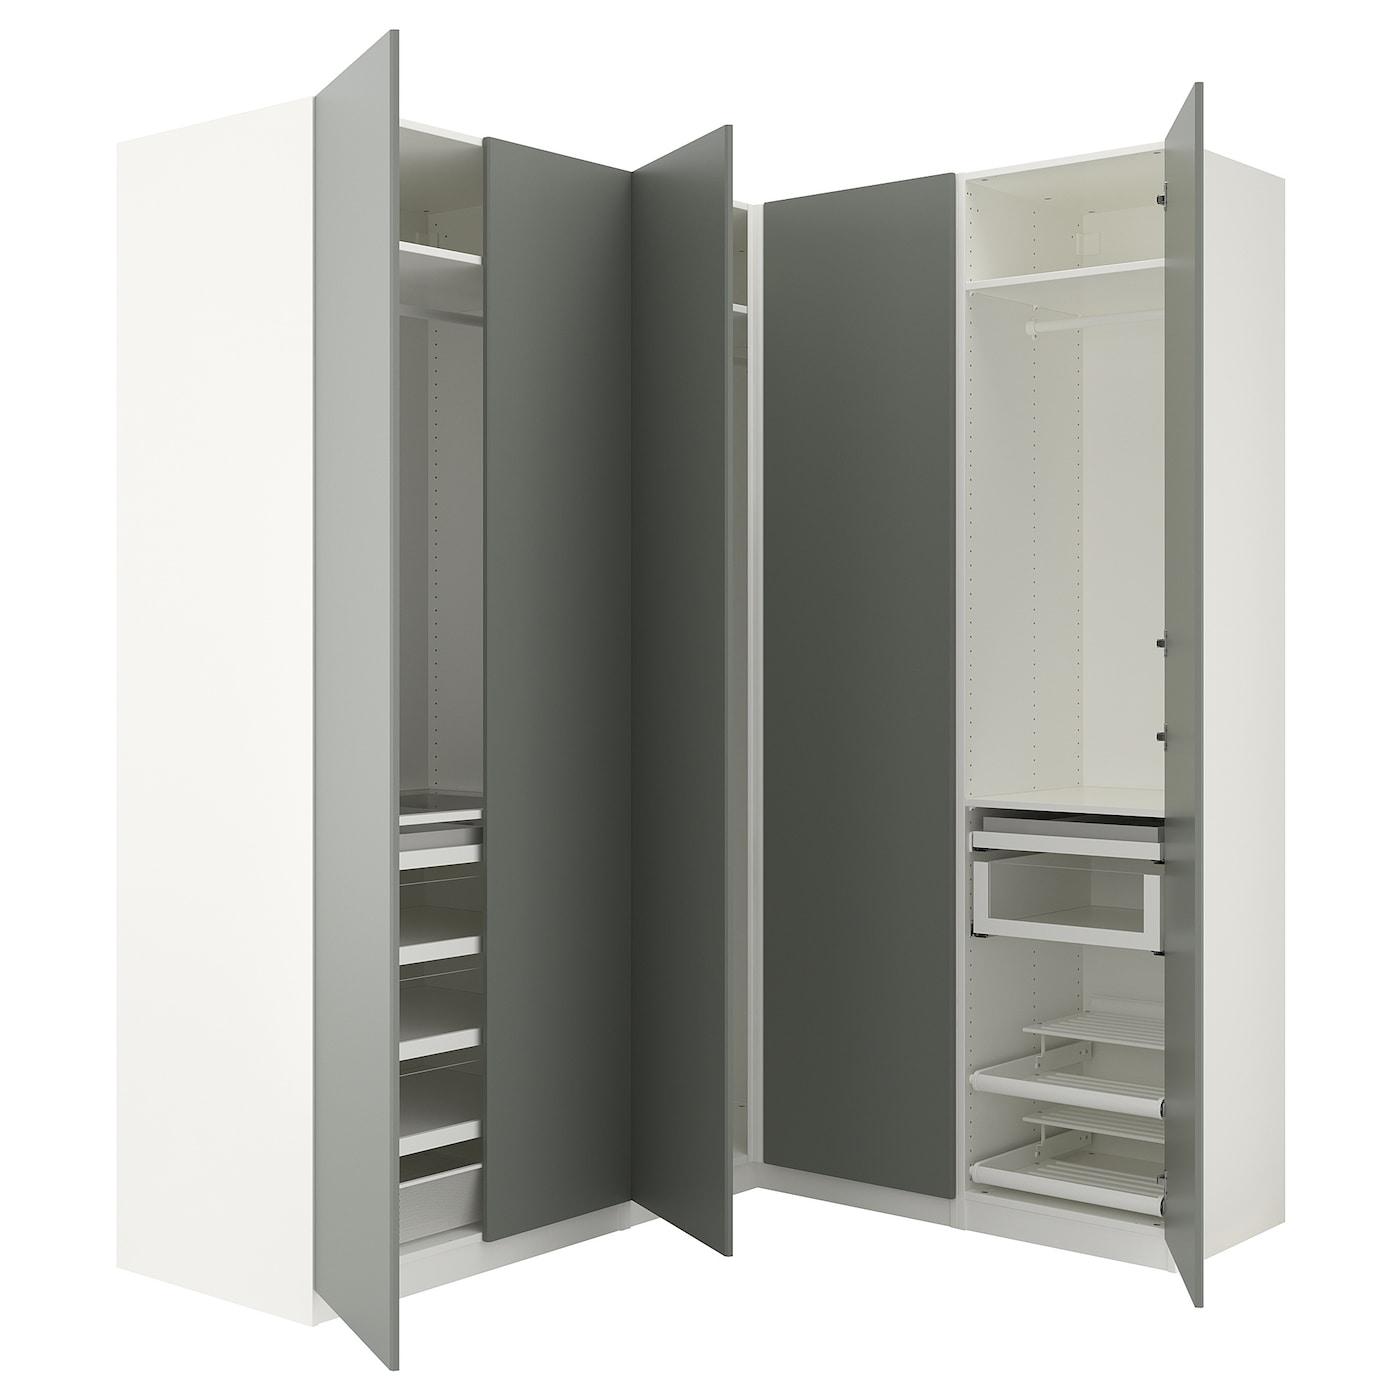 pax corner wardrobe white reinsvoll grey green 210 160 x 236 cm ikea. Black Bedroom Furniture Sets. Home Design Ideas